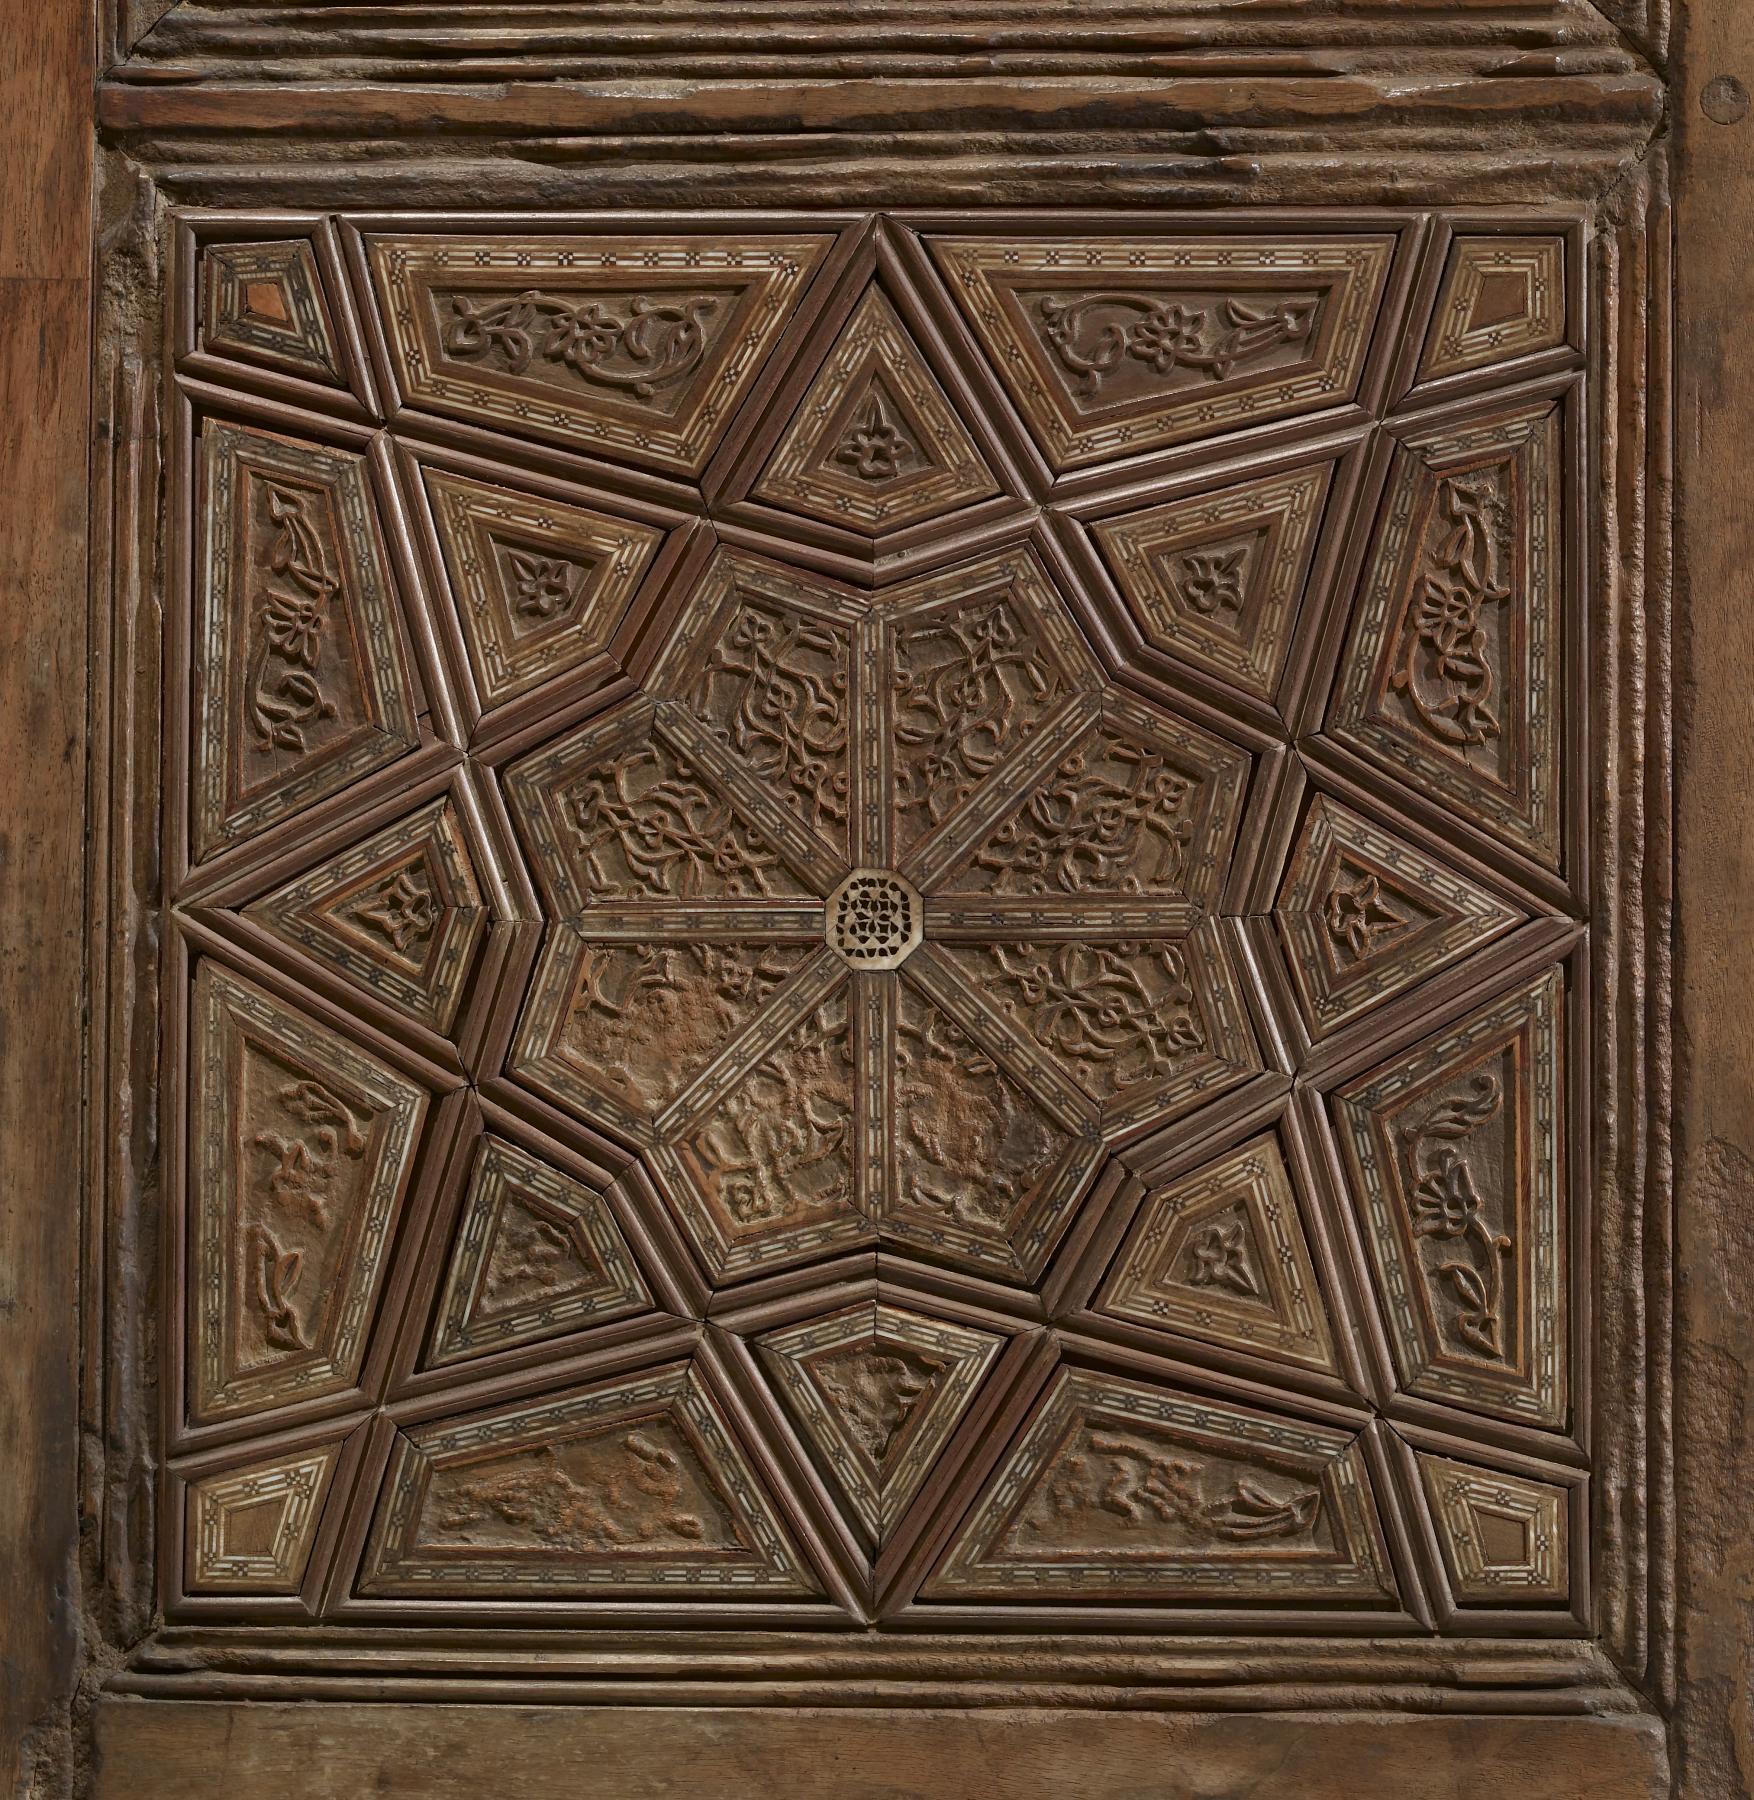 File:Qanbar ibn Mahmud - Mausoleum Doors - Walters 61297 - Detail A.jpg